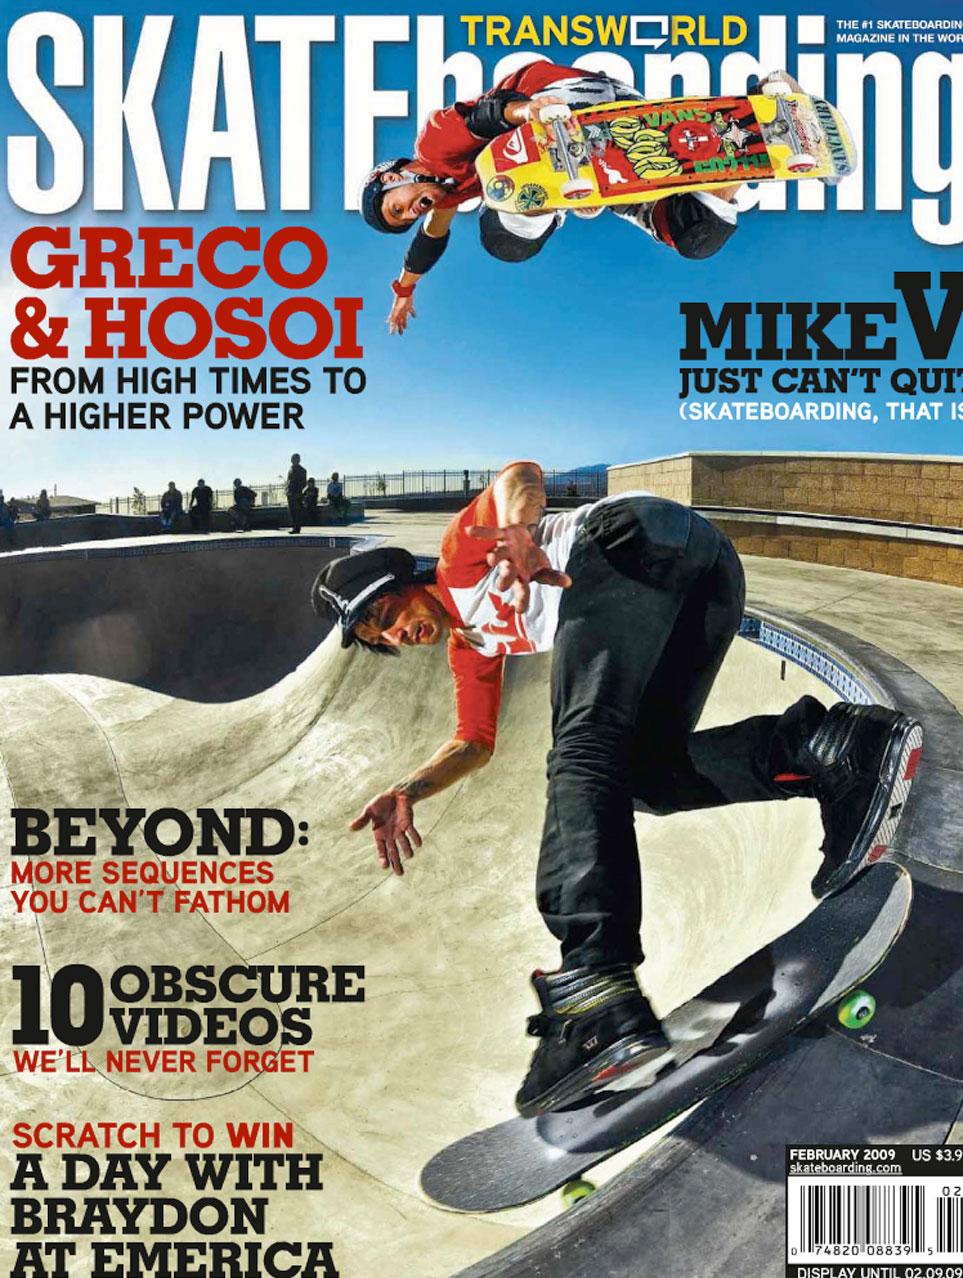 Couverture du magazine de skateboard TRANSWORLD 2009 avec Christian HOSOI